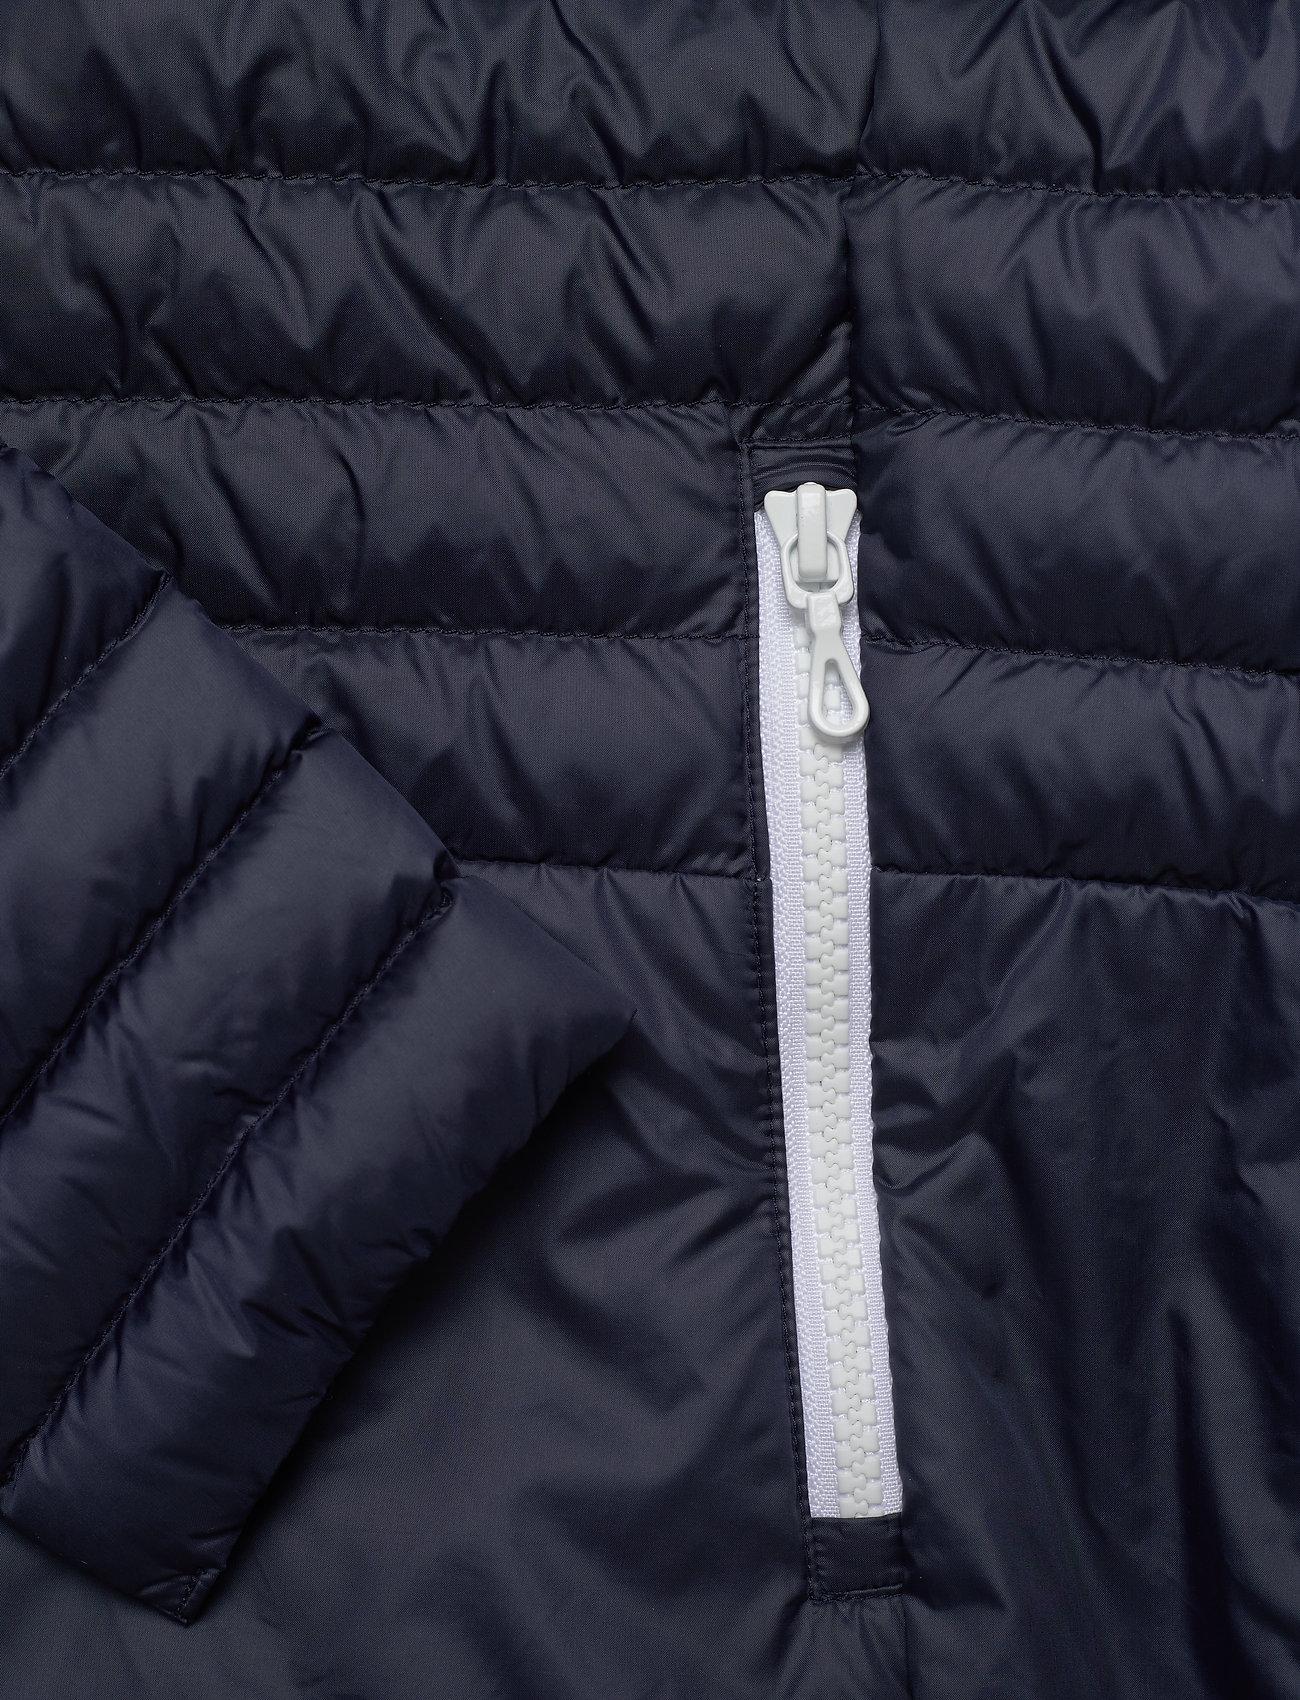 Colmar Ladies Down Jacket - Jackor & Kappor 068 Navy Blue-light Stee